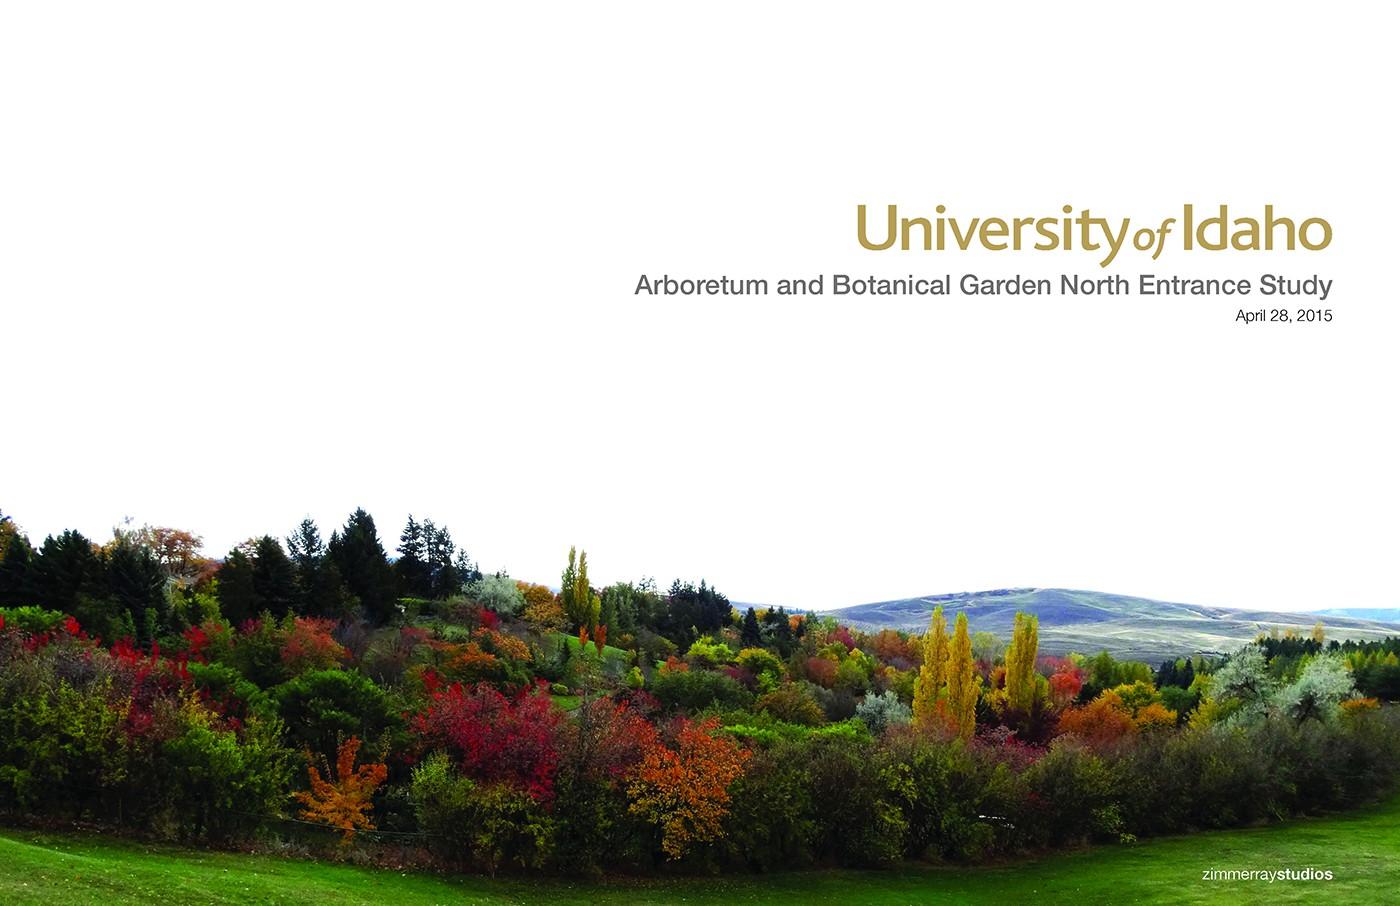 University of Idaho Arboreta | Zimmerray Studios